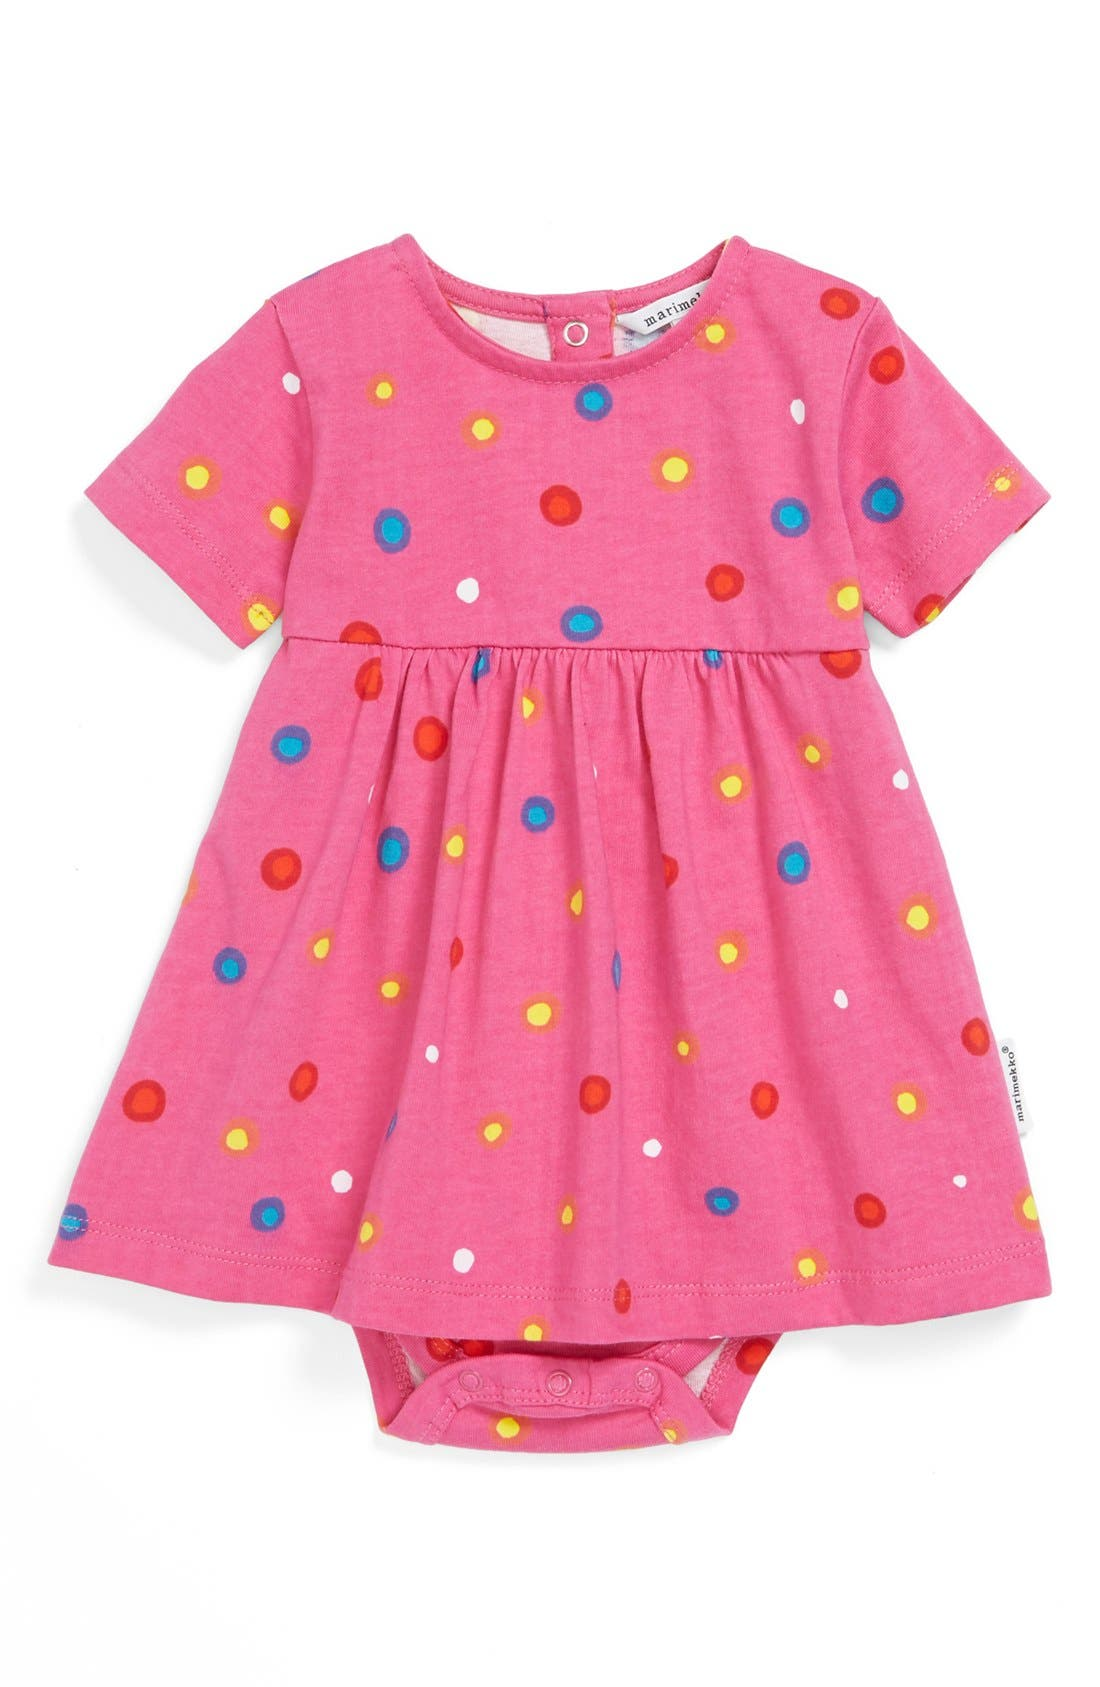 Main Image - Marimekko Polka Dot Bodysuit (Baby Girls)